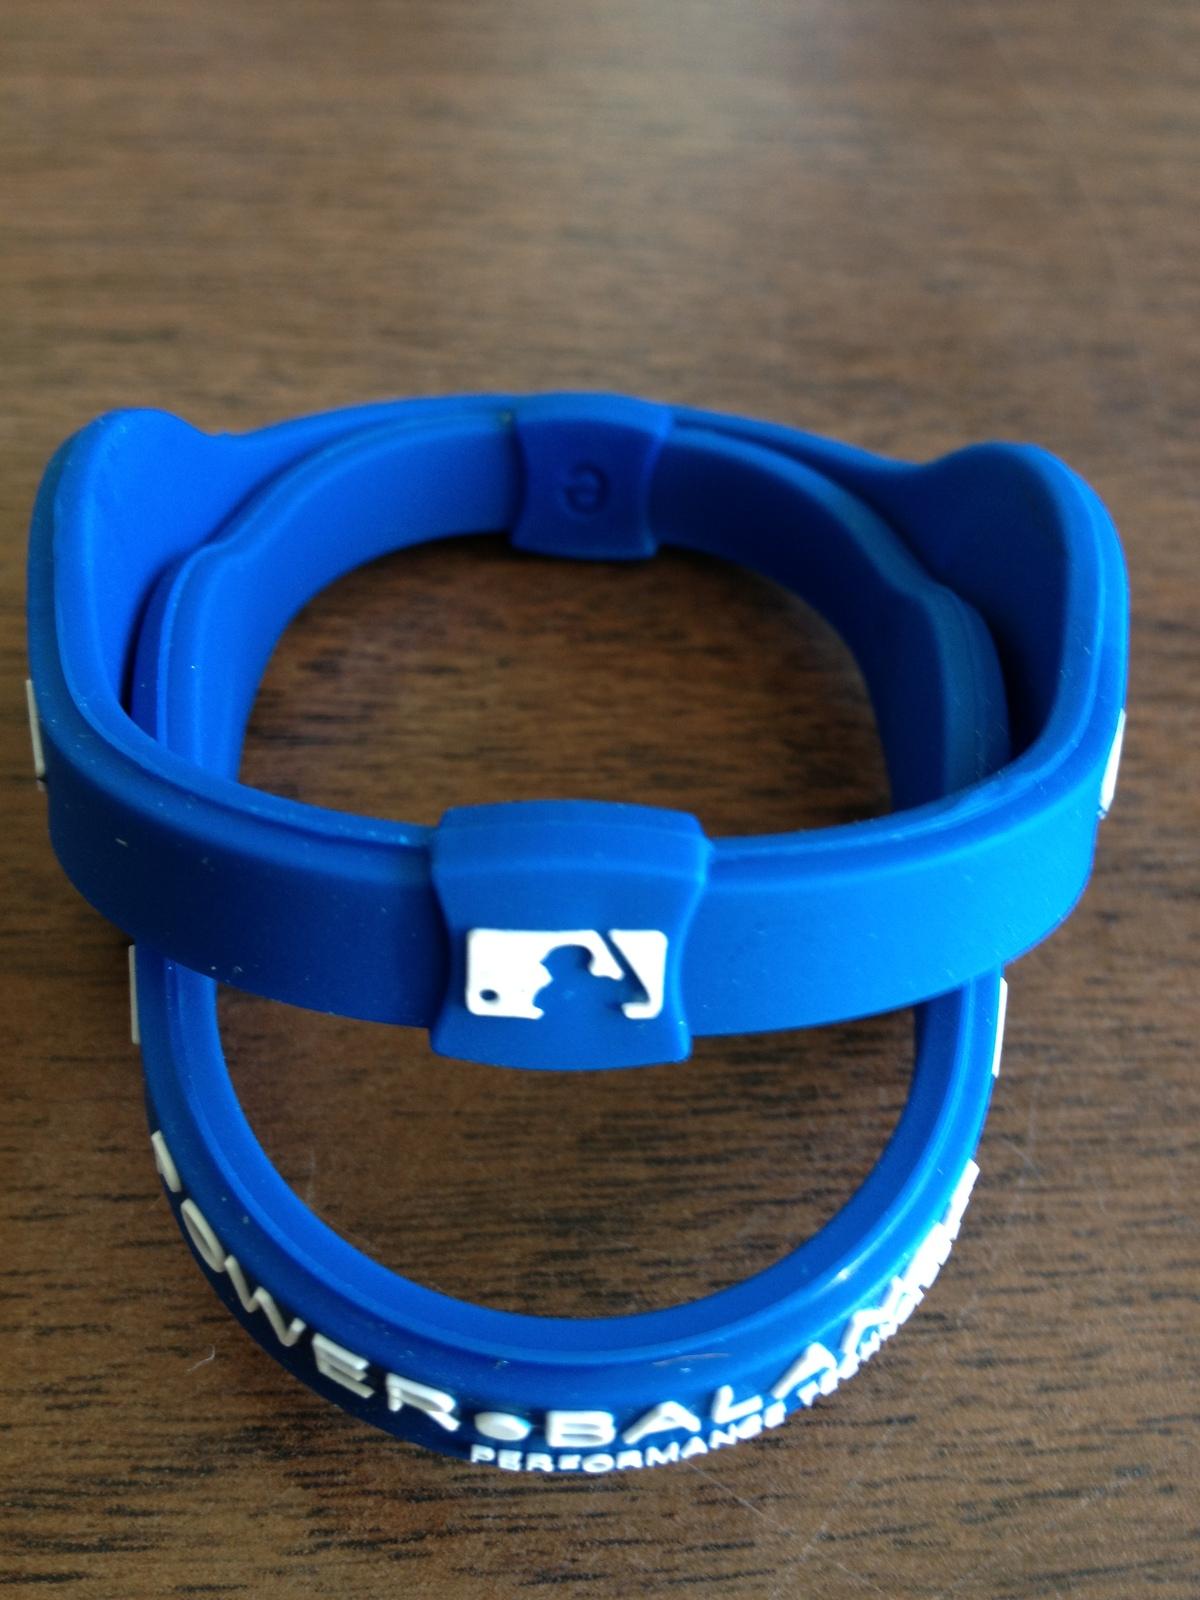 MLB Power Energy Bracelets image 14